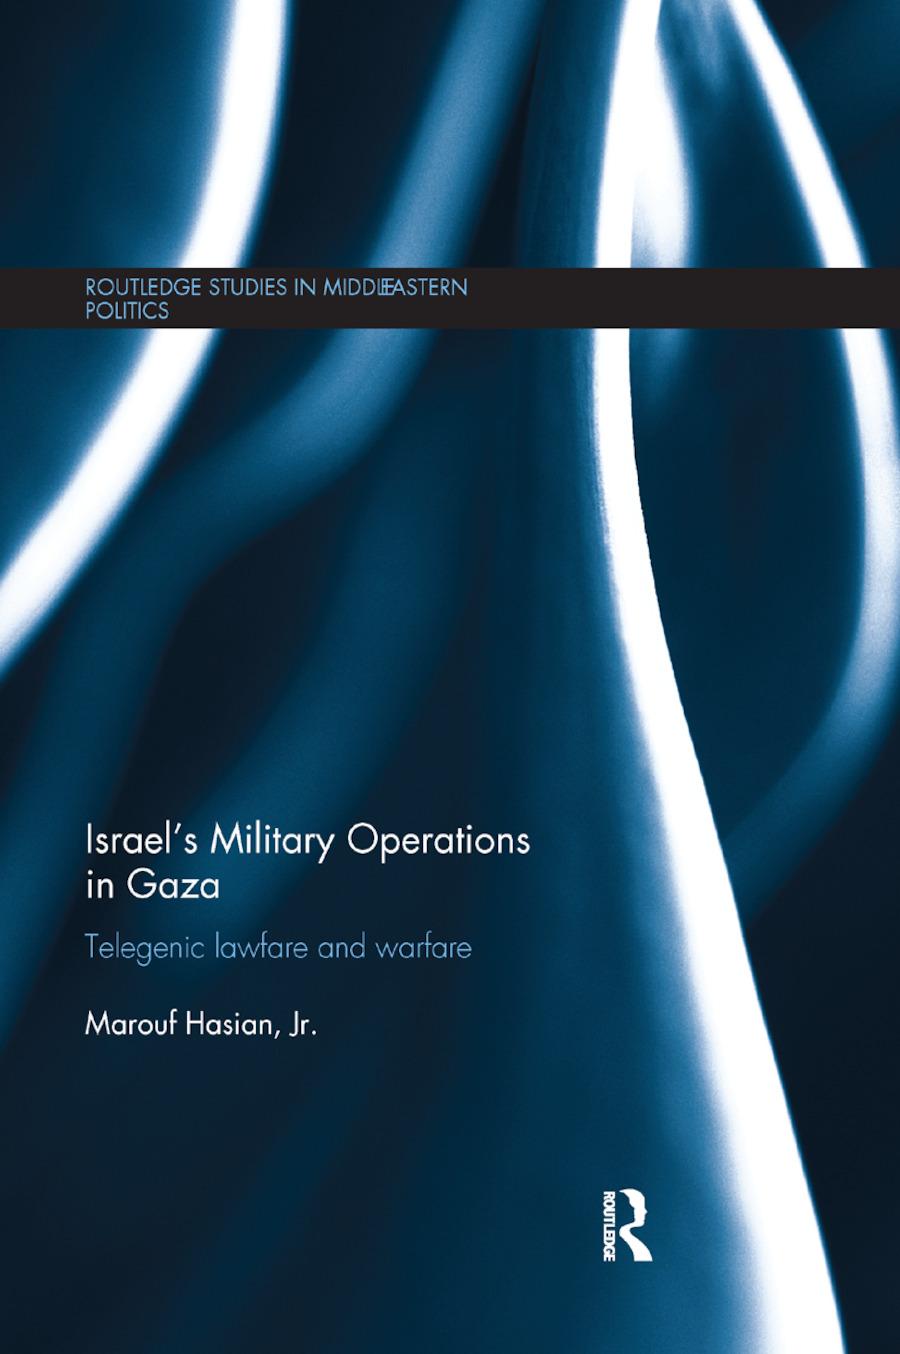 Israel's Military Operations in Gaza: Telegenic Lawfare and Warfare book cover